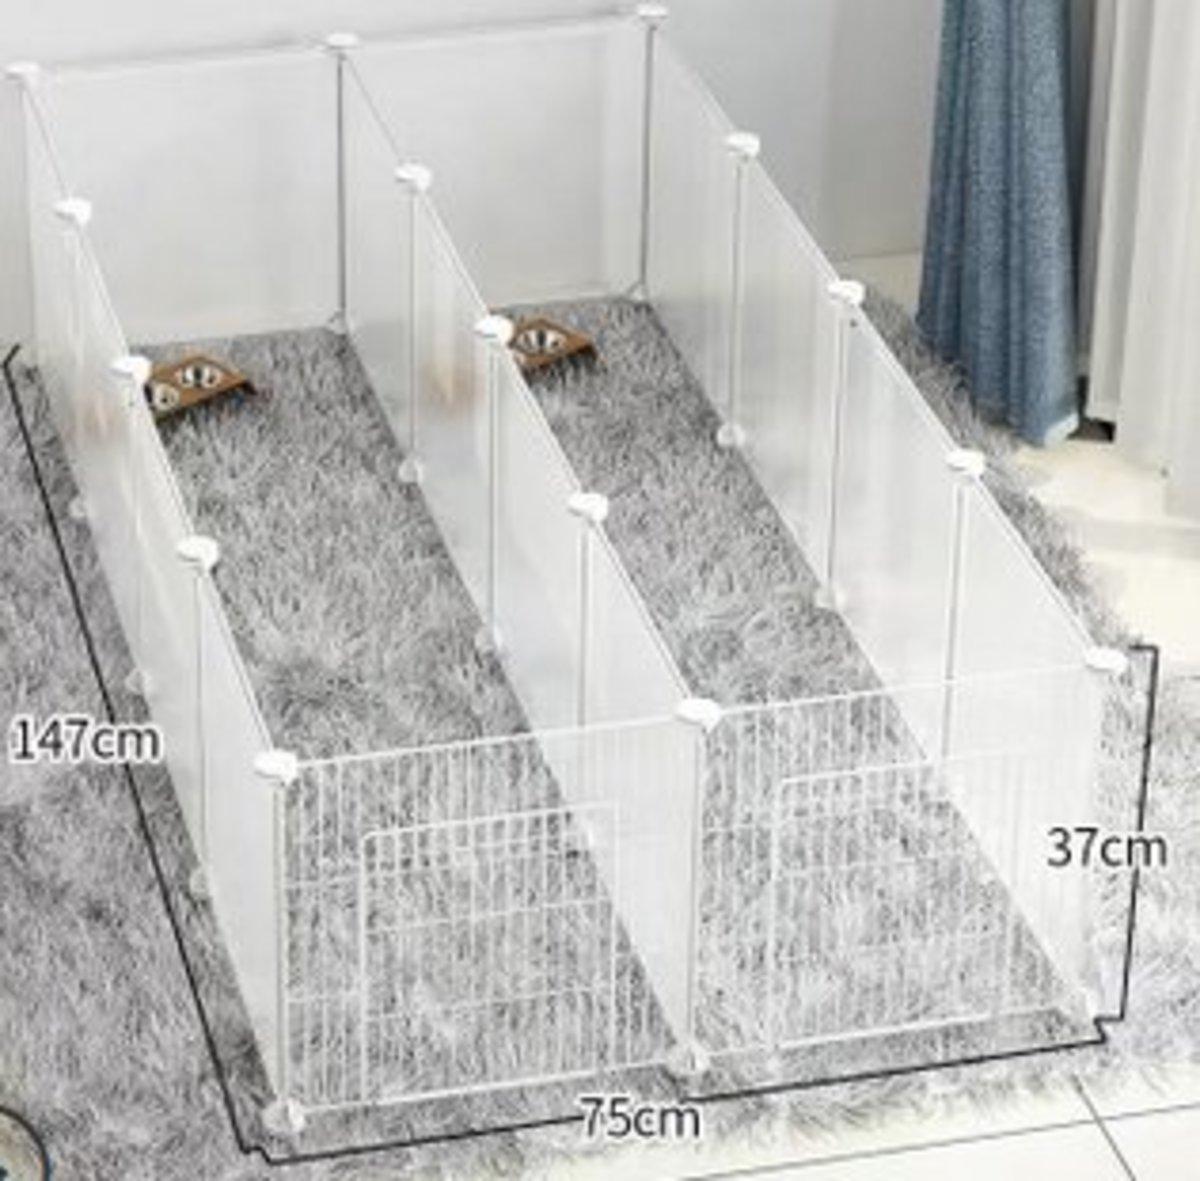 DIY 自由組裝寵物圍欄寵物窩(4格加4格帶門)